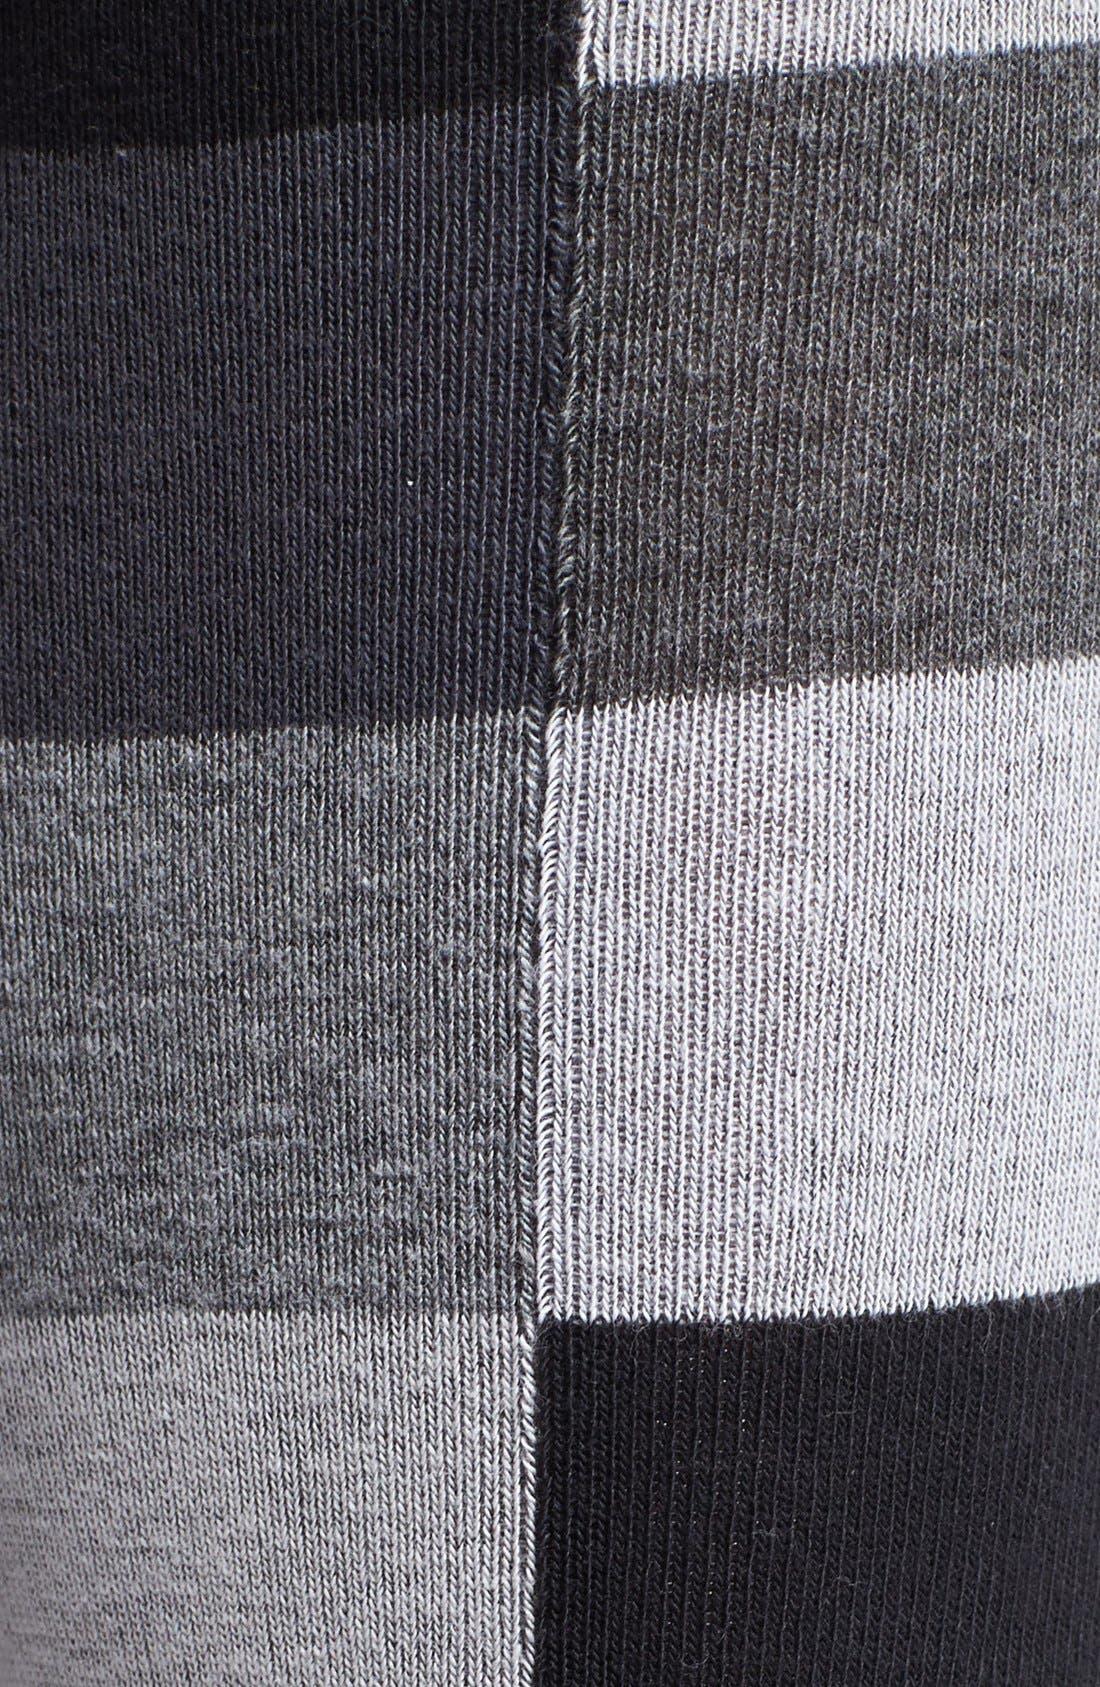 Alternate Image 2  - Hue Colorblock Knee High Socks